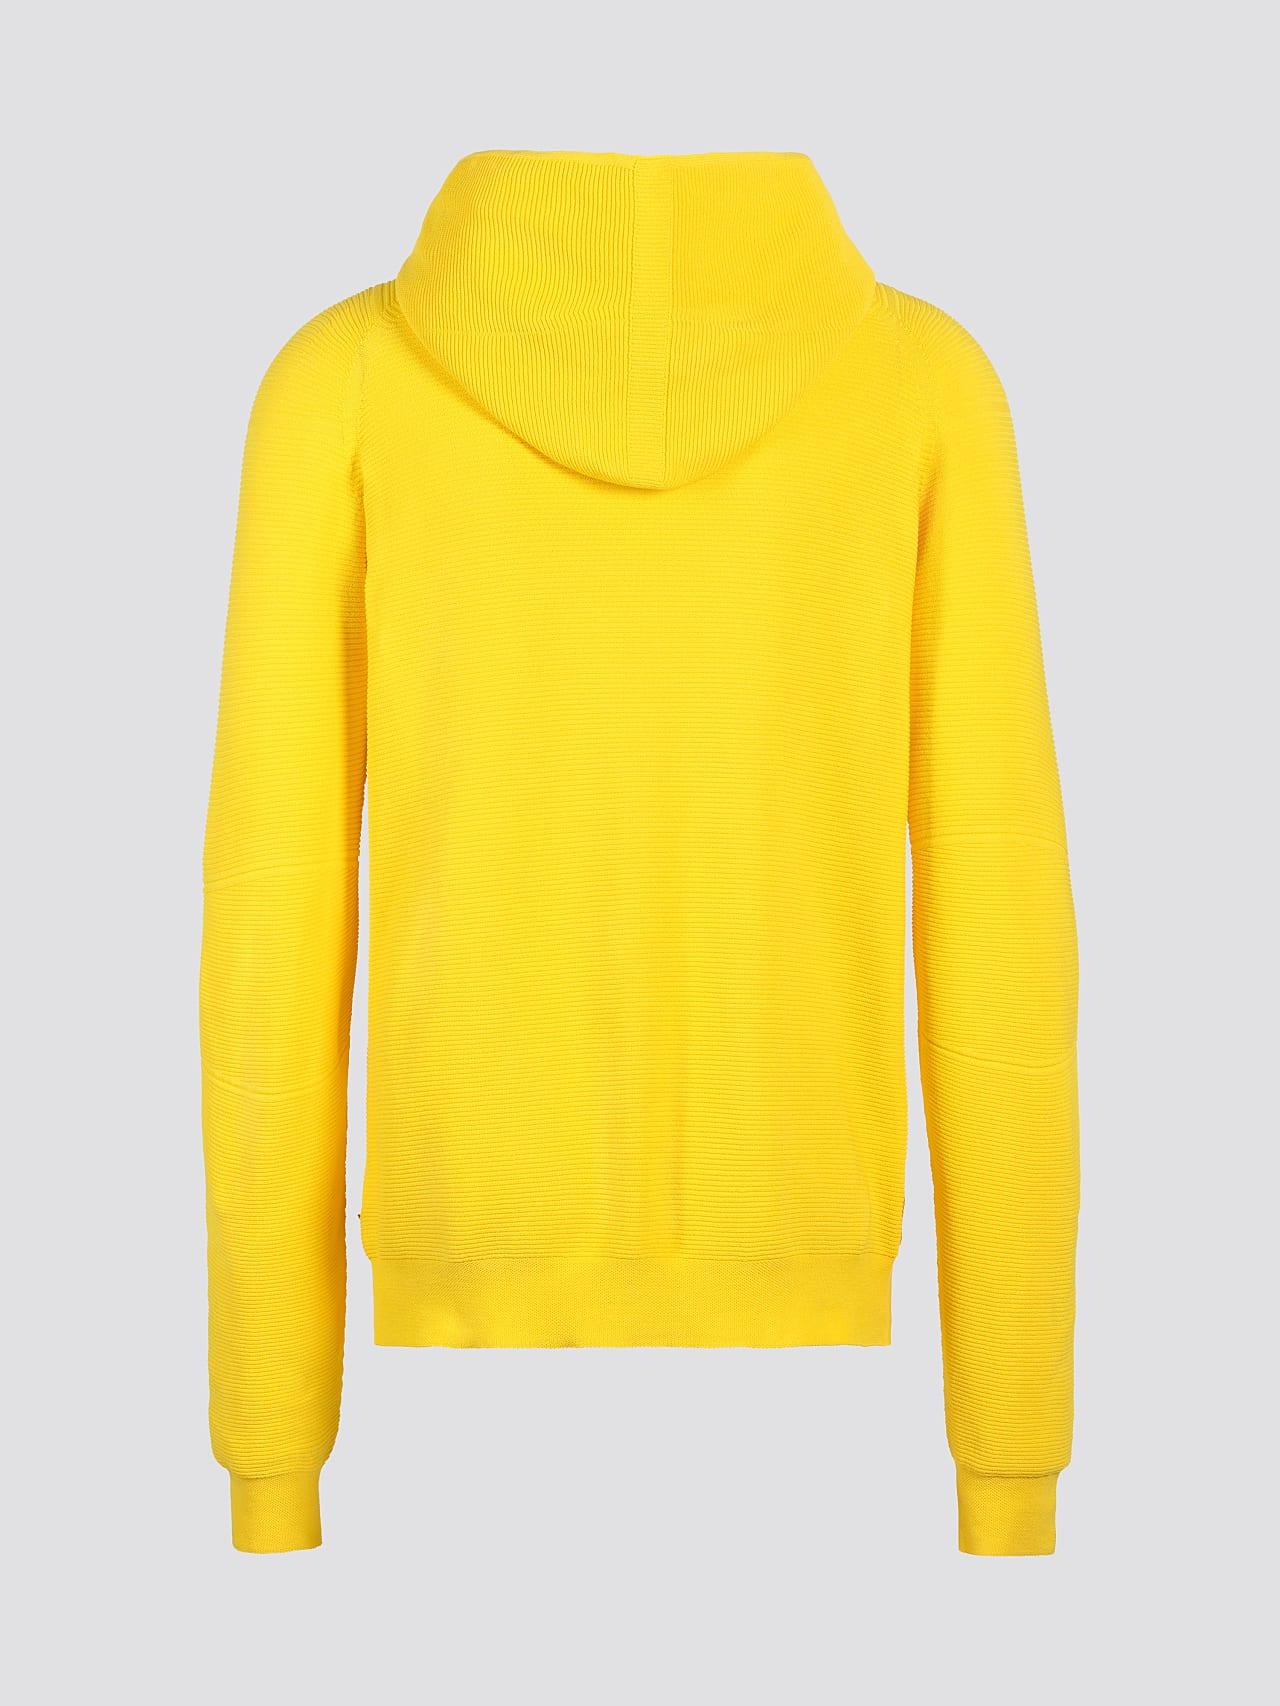 FURAP V3.Y5.01 Seamless Knit Hoodie yellow Left Alpha Tauri